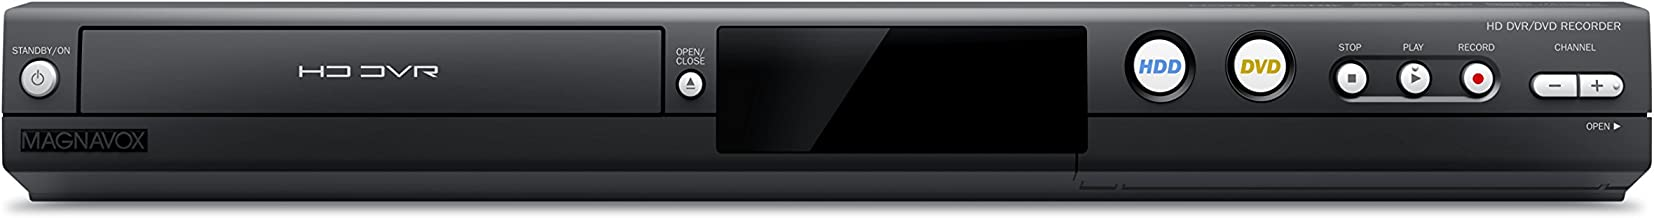 Magnavox MDR867H HD DVR/DVD Recorder with Digital Tuner (Black)